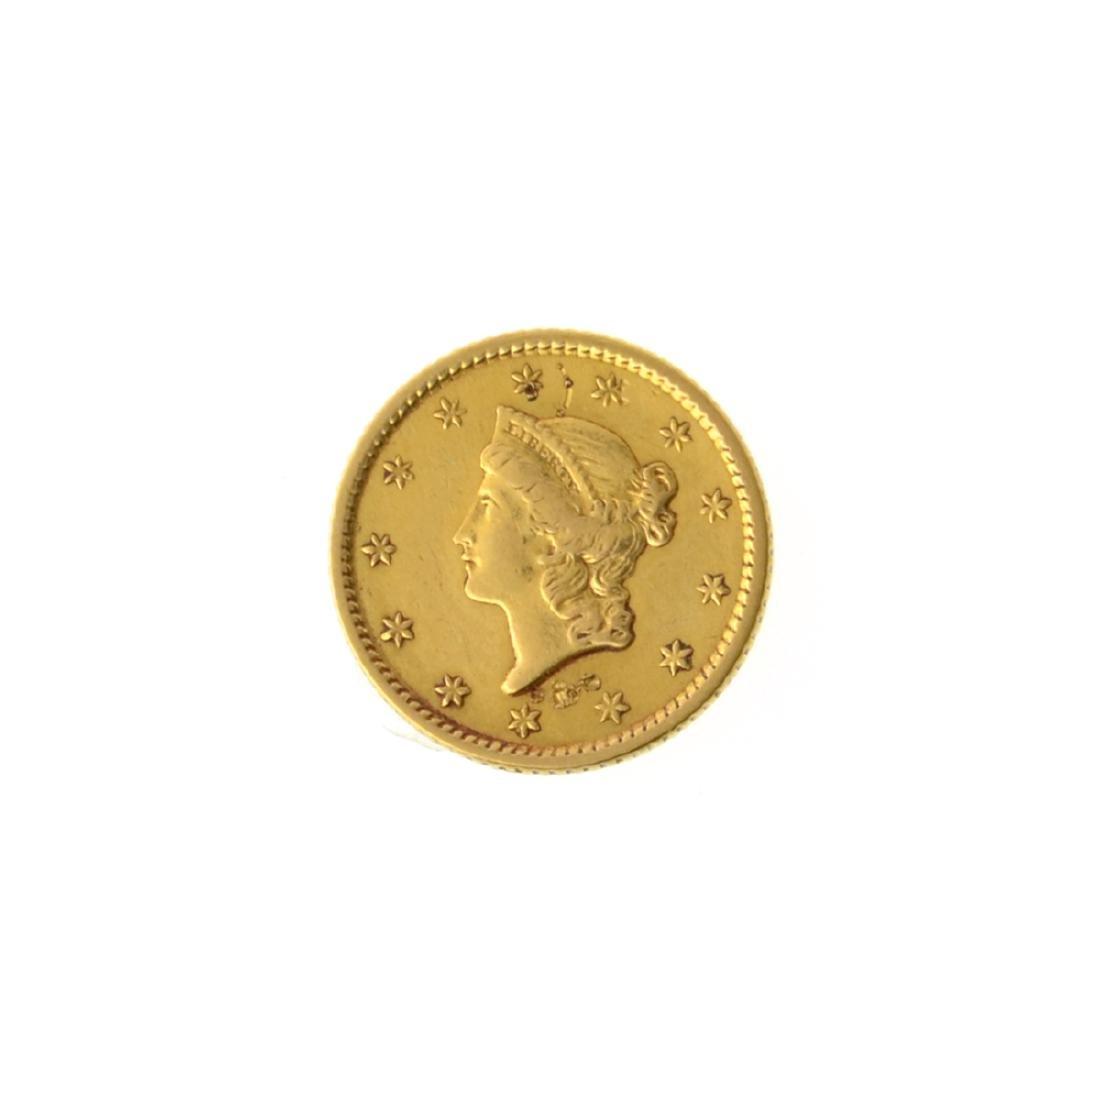 *1853 $1 U.S. Liberty Head Gold Coin (JG-MRT)